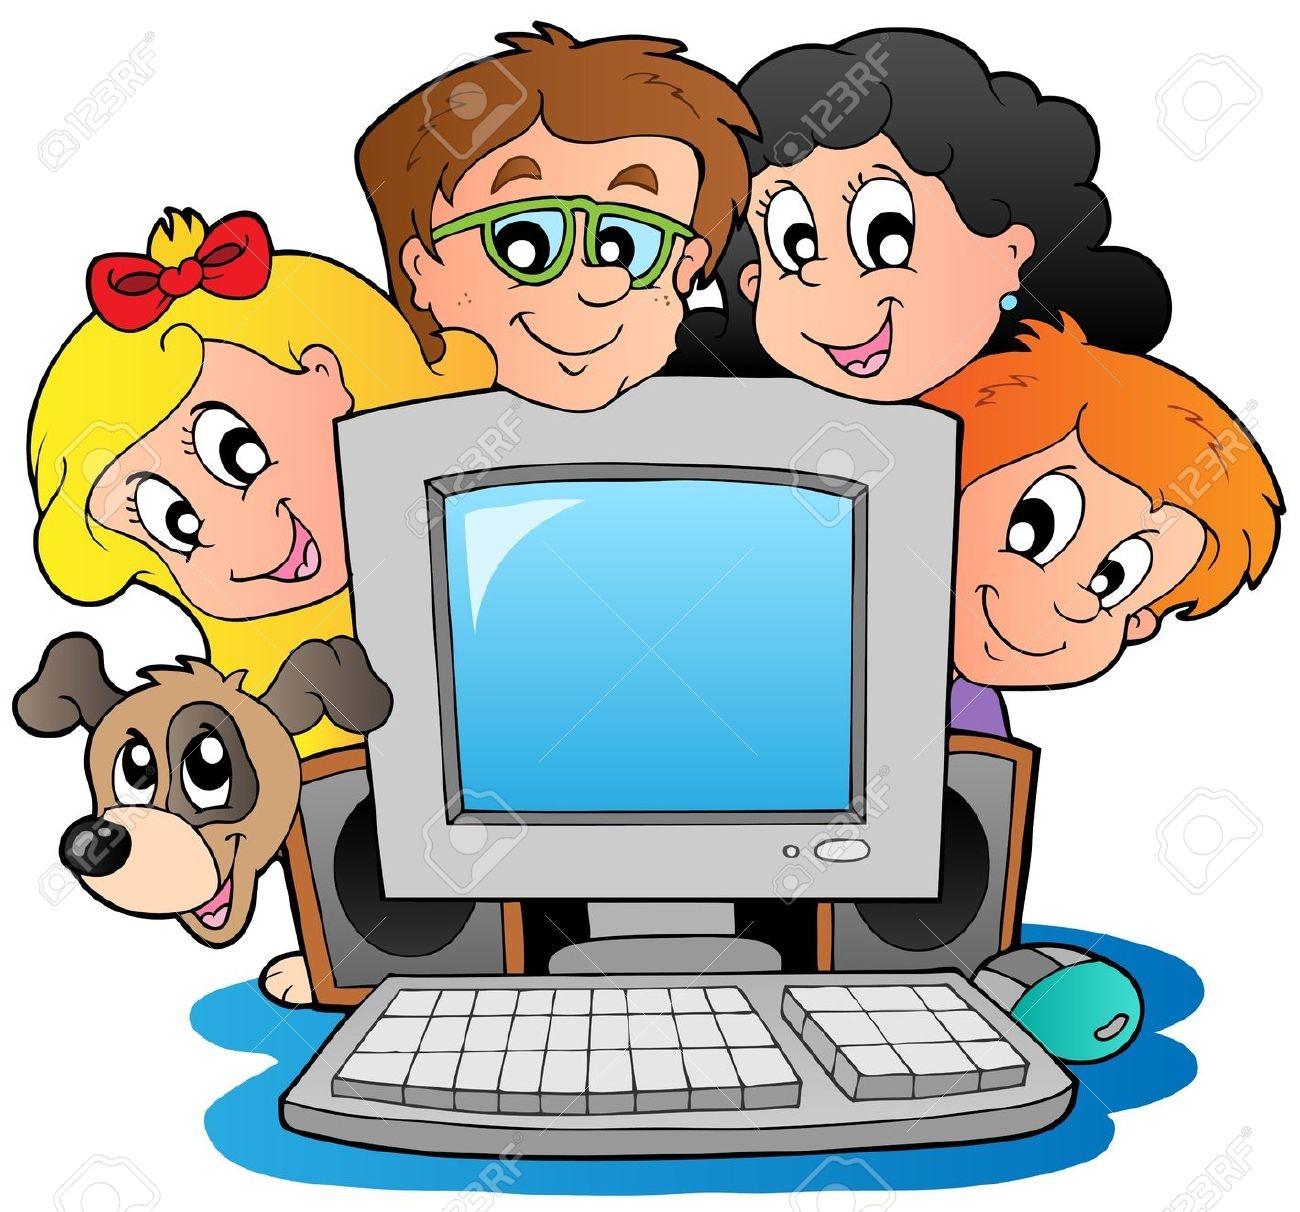 computer class clipart for kids #9